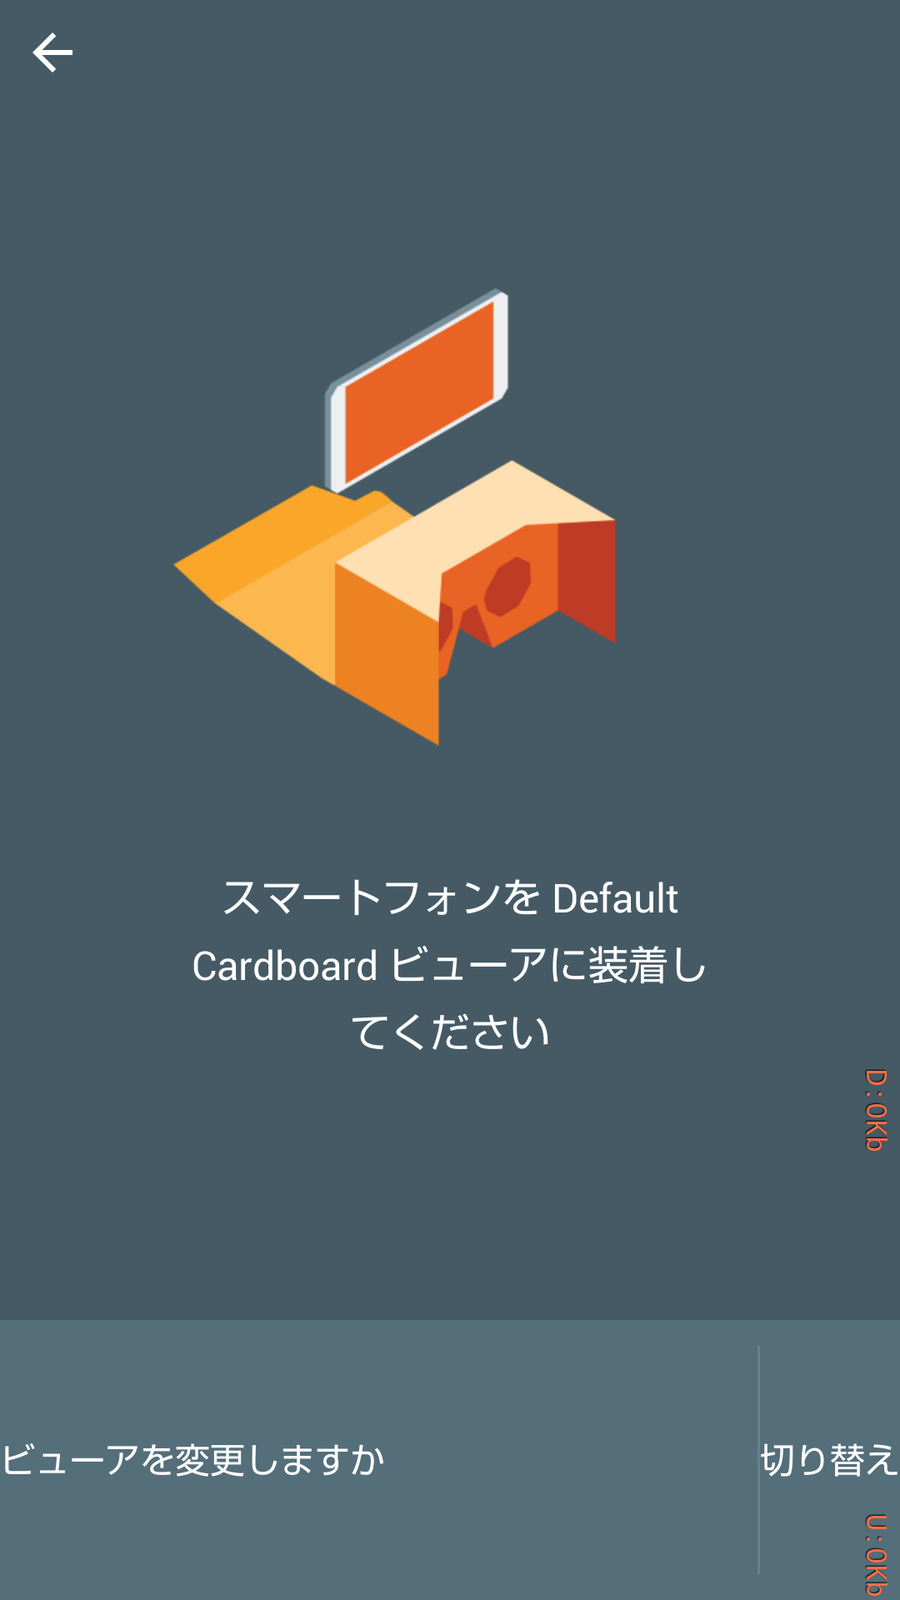 7cardboard_2